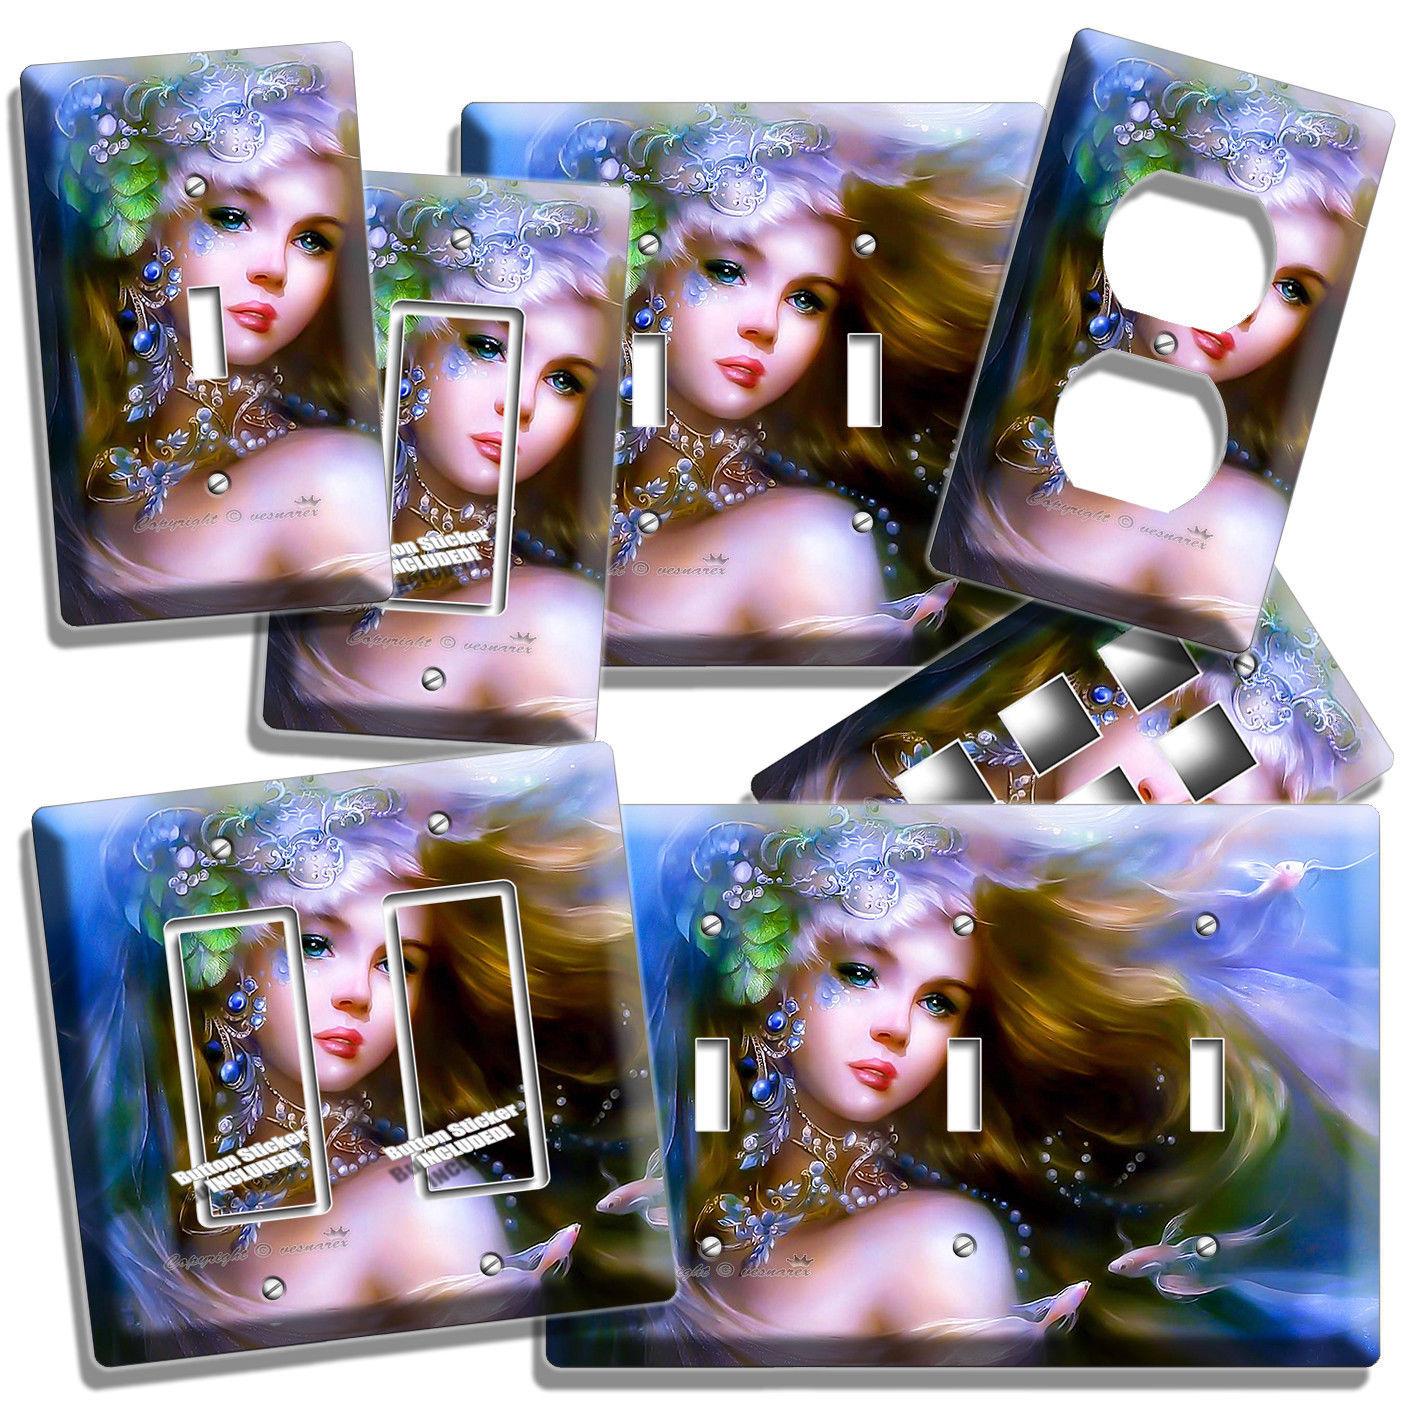 SWEET LITTLE MERMAID BEAUTIFUL GIRL LIGHT SWITCH OUTLET WALL PLATE ROOM HD DECOR - $10.99 - $21.99